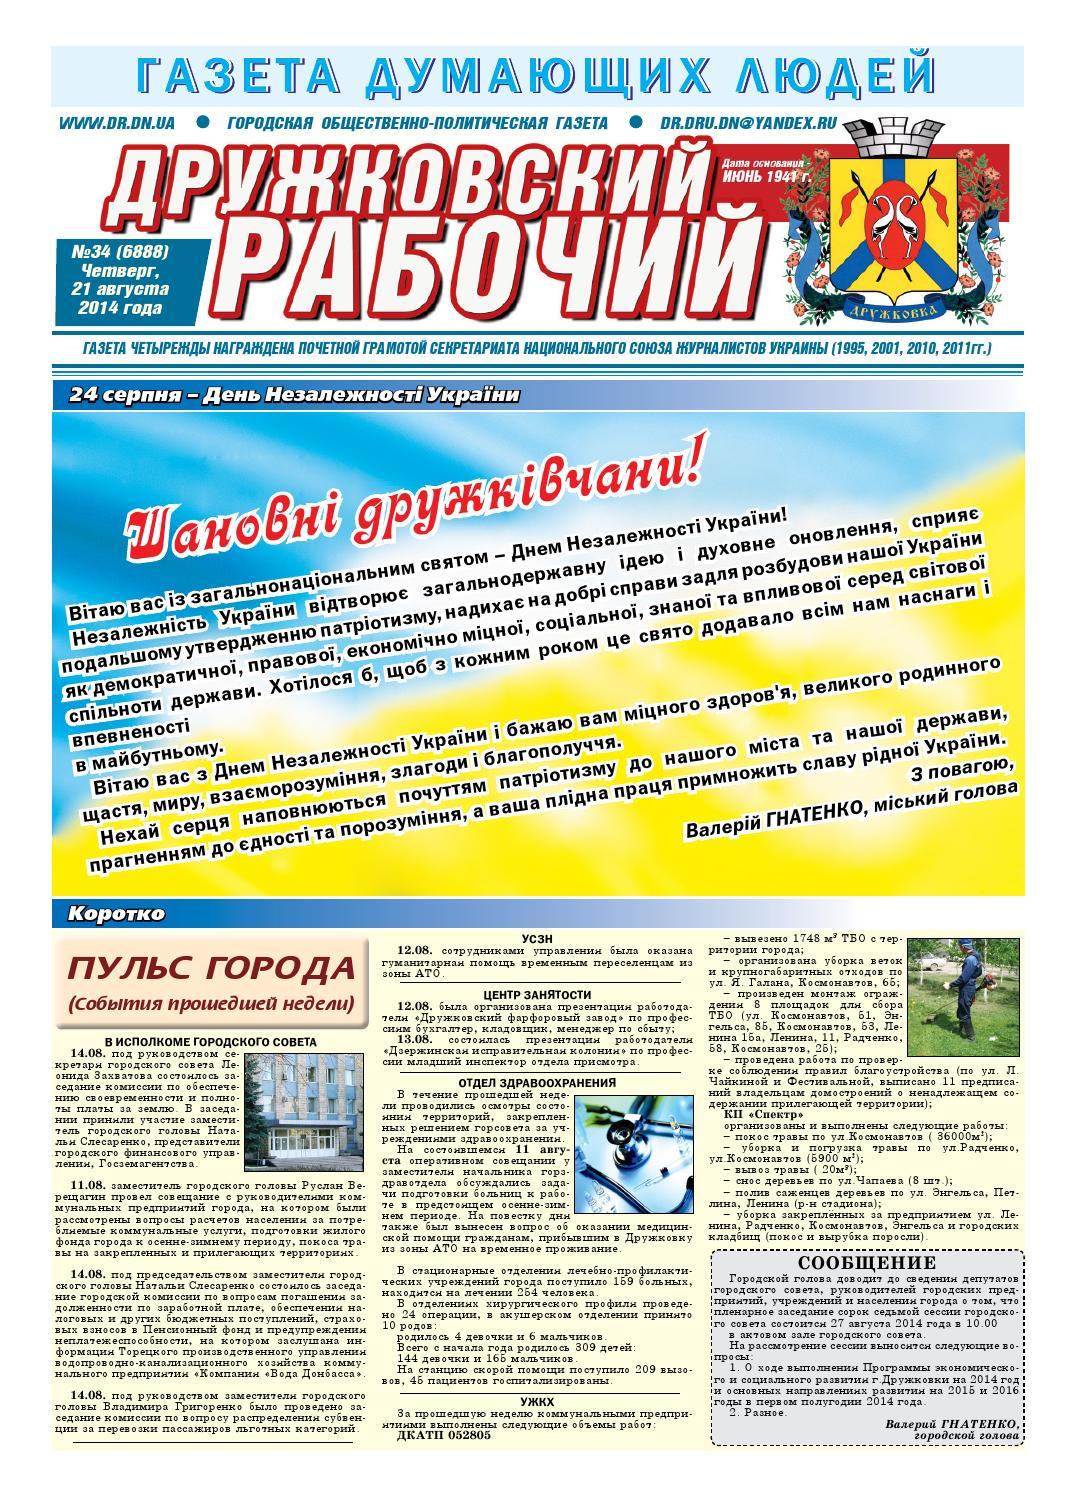 нов бланки пфу 11 08 2013